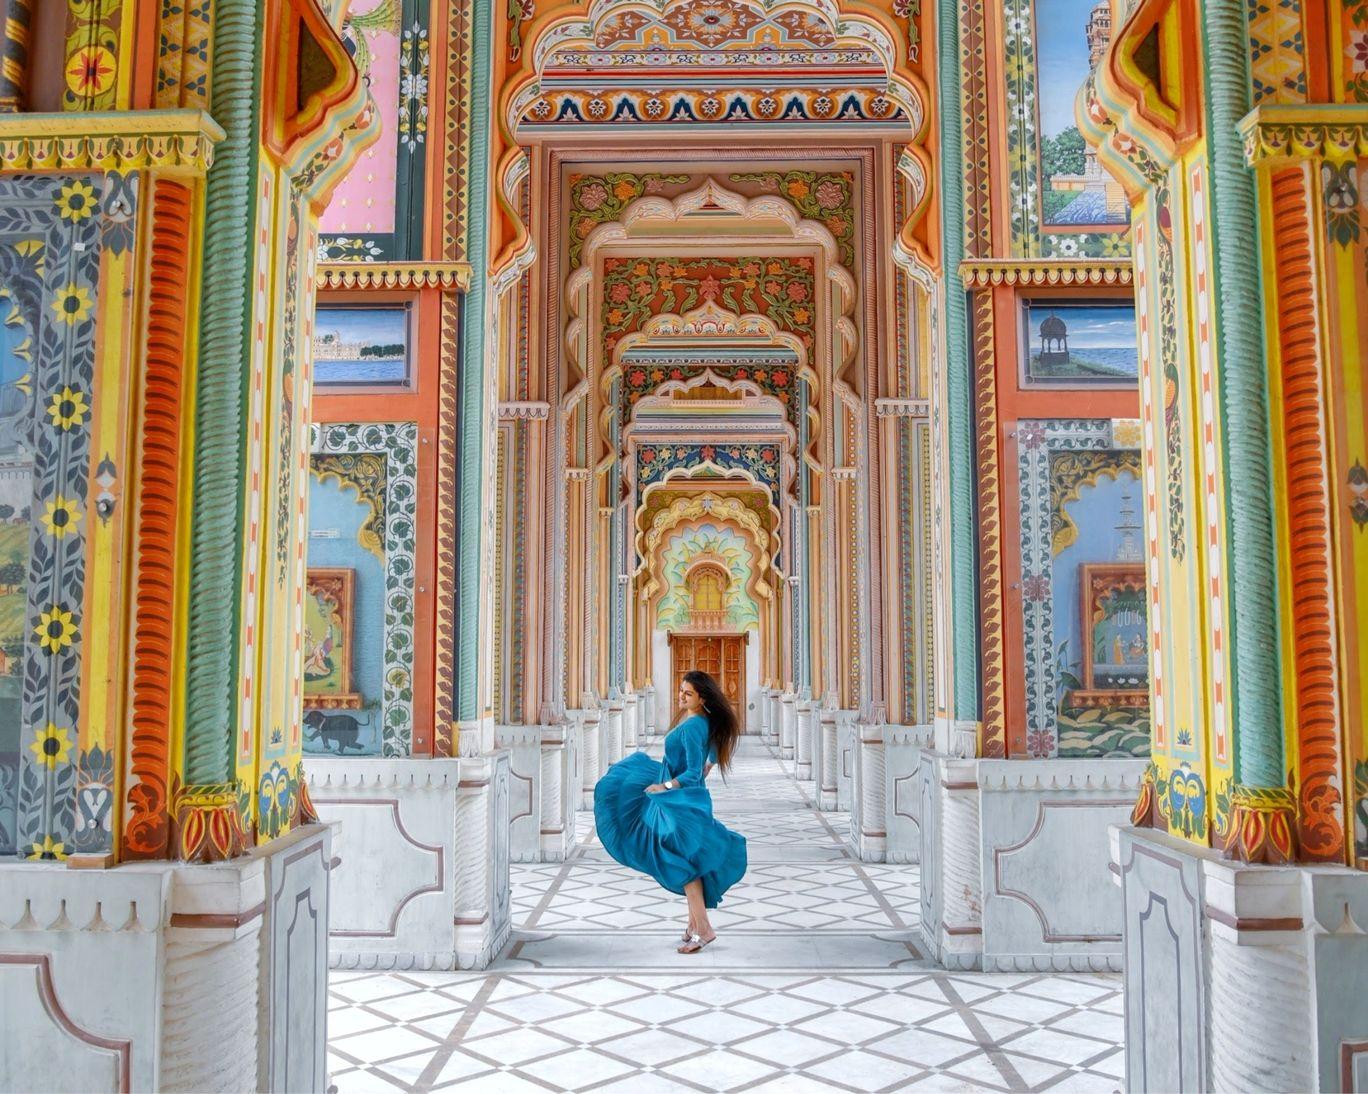 Photo of Patrika Gate By Neha Sudan